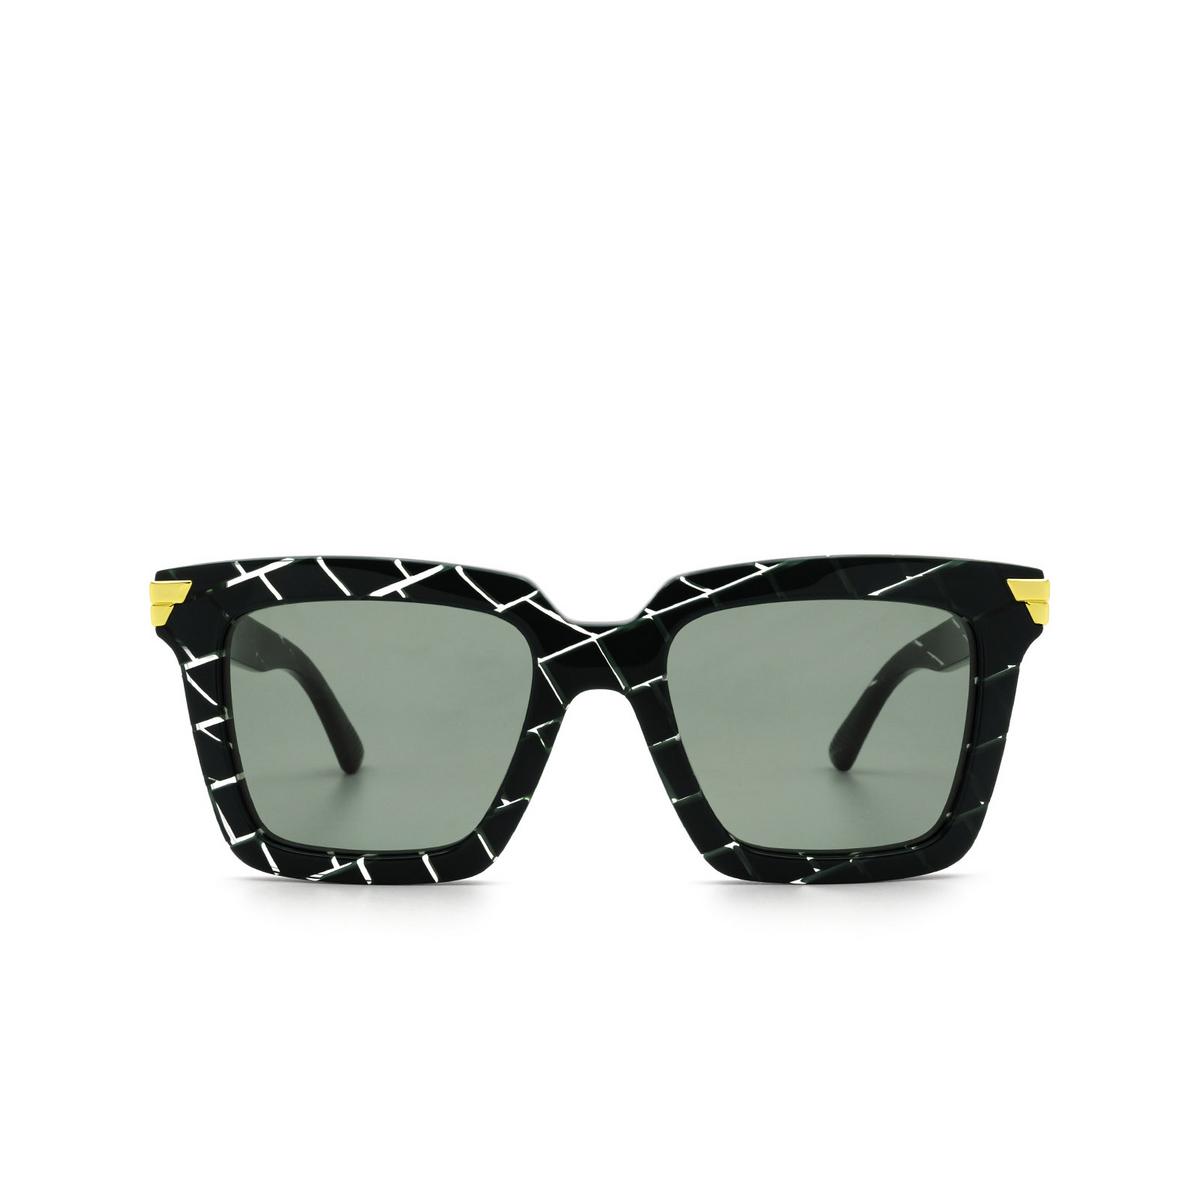 Bottega Veneta® Square Sunglasses: BV1005S color Green 008 - front view.